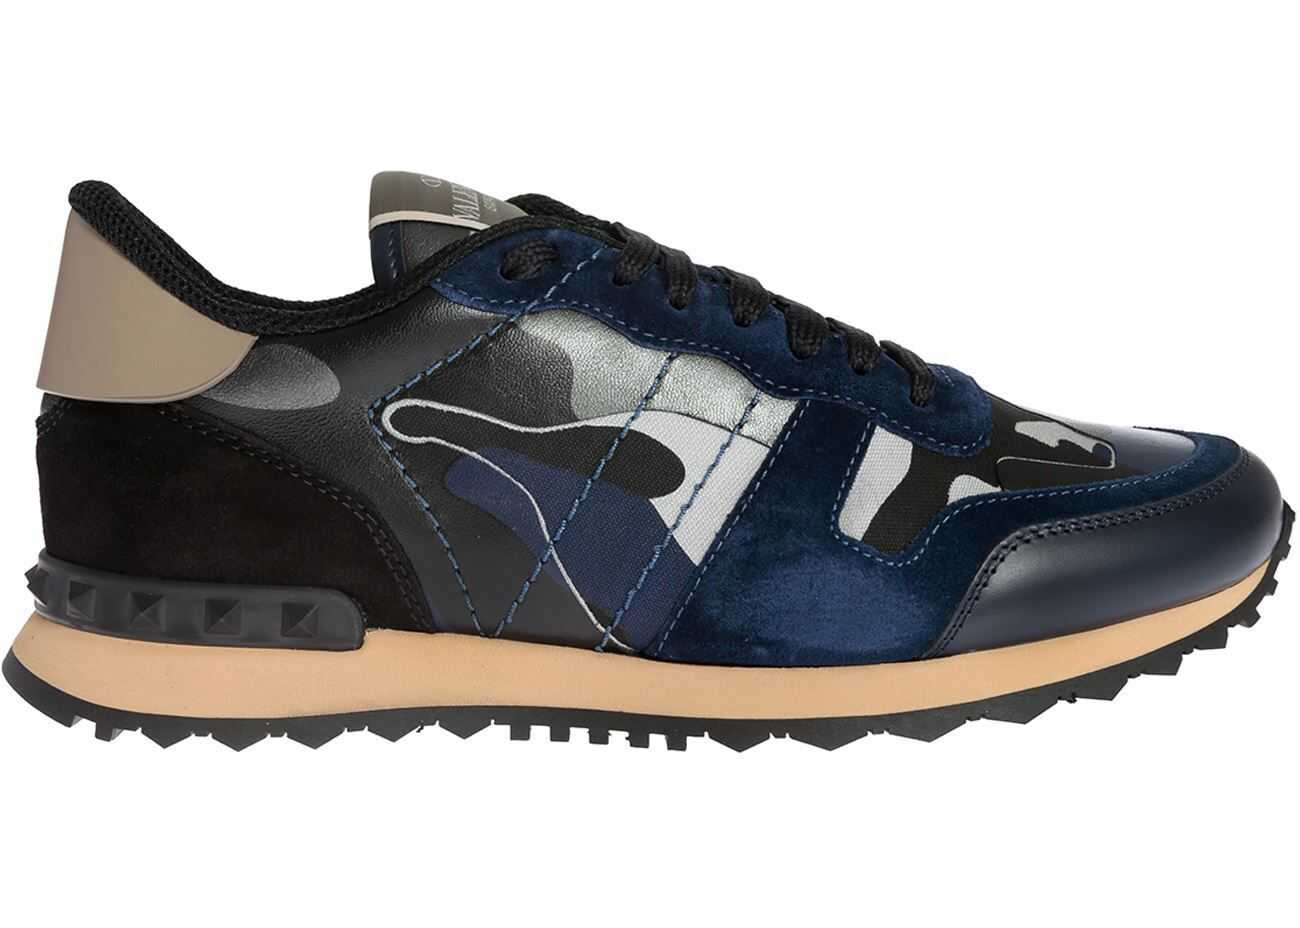 Valentino Garavani Rockrunner Sneaker Camouflage In Blue Blue